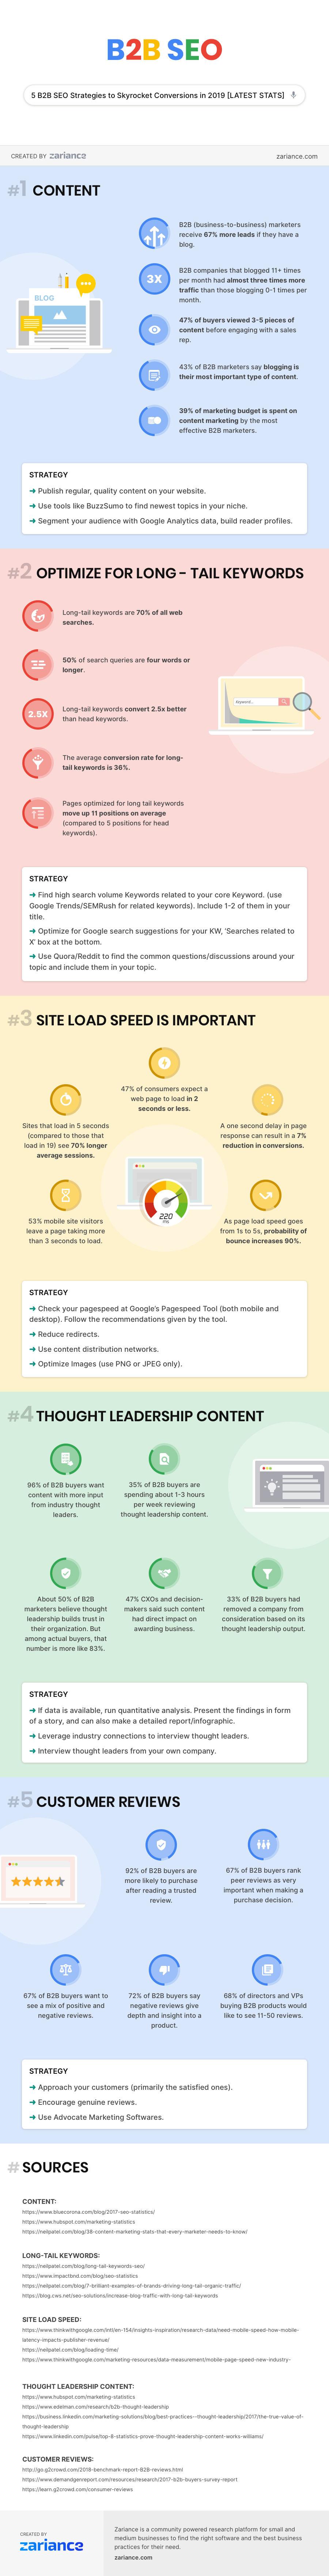 B2B SEO Infographic: Stats and Strategies